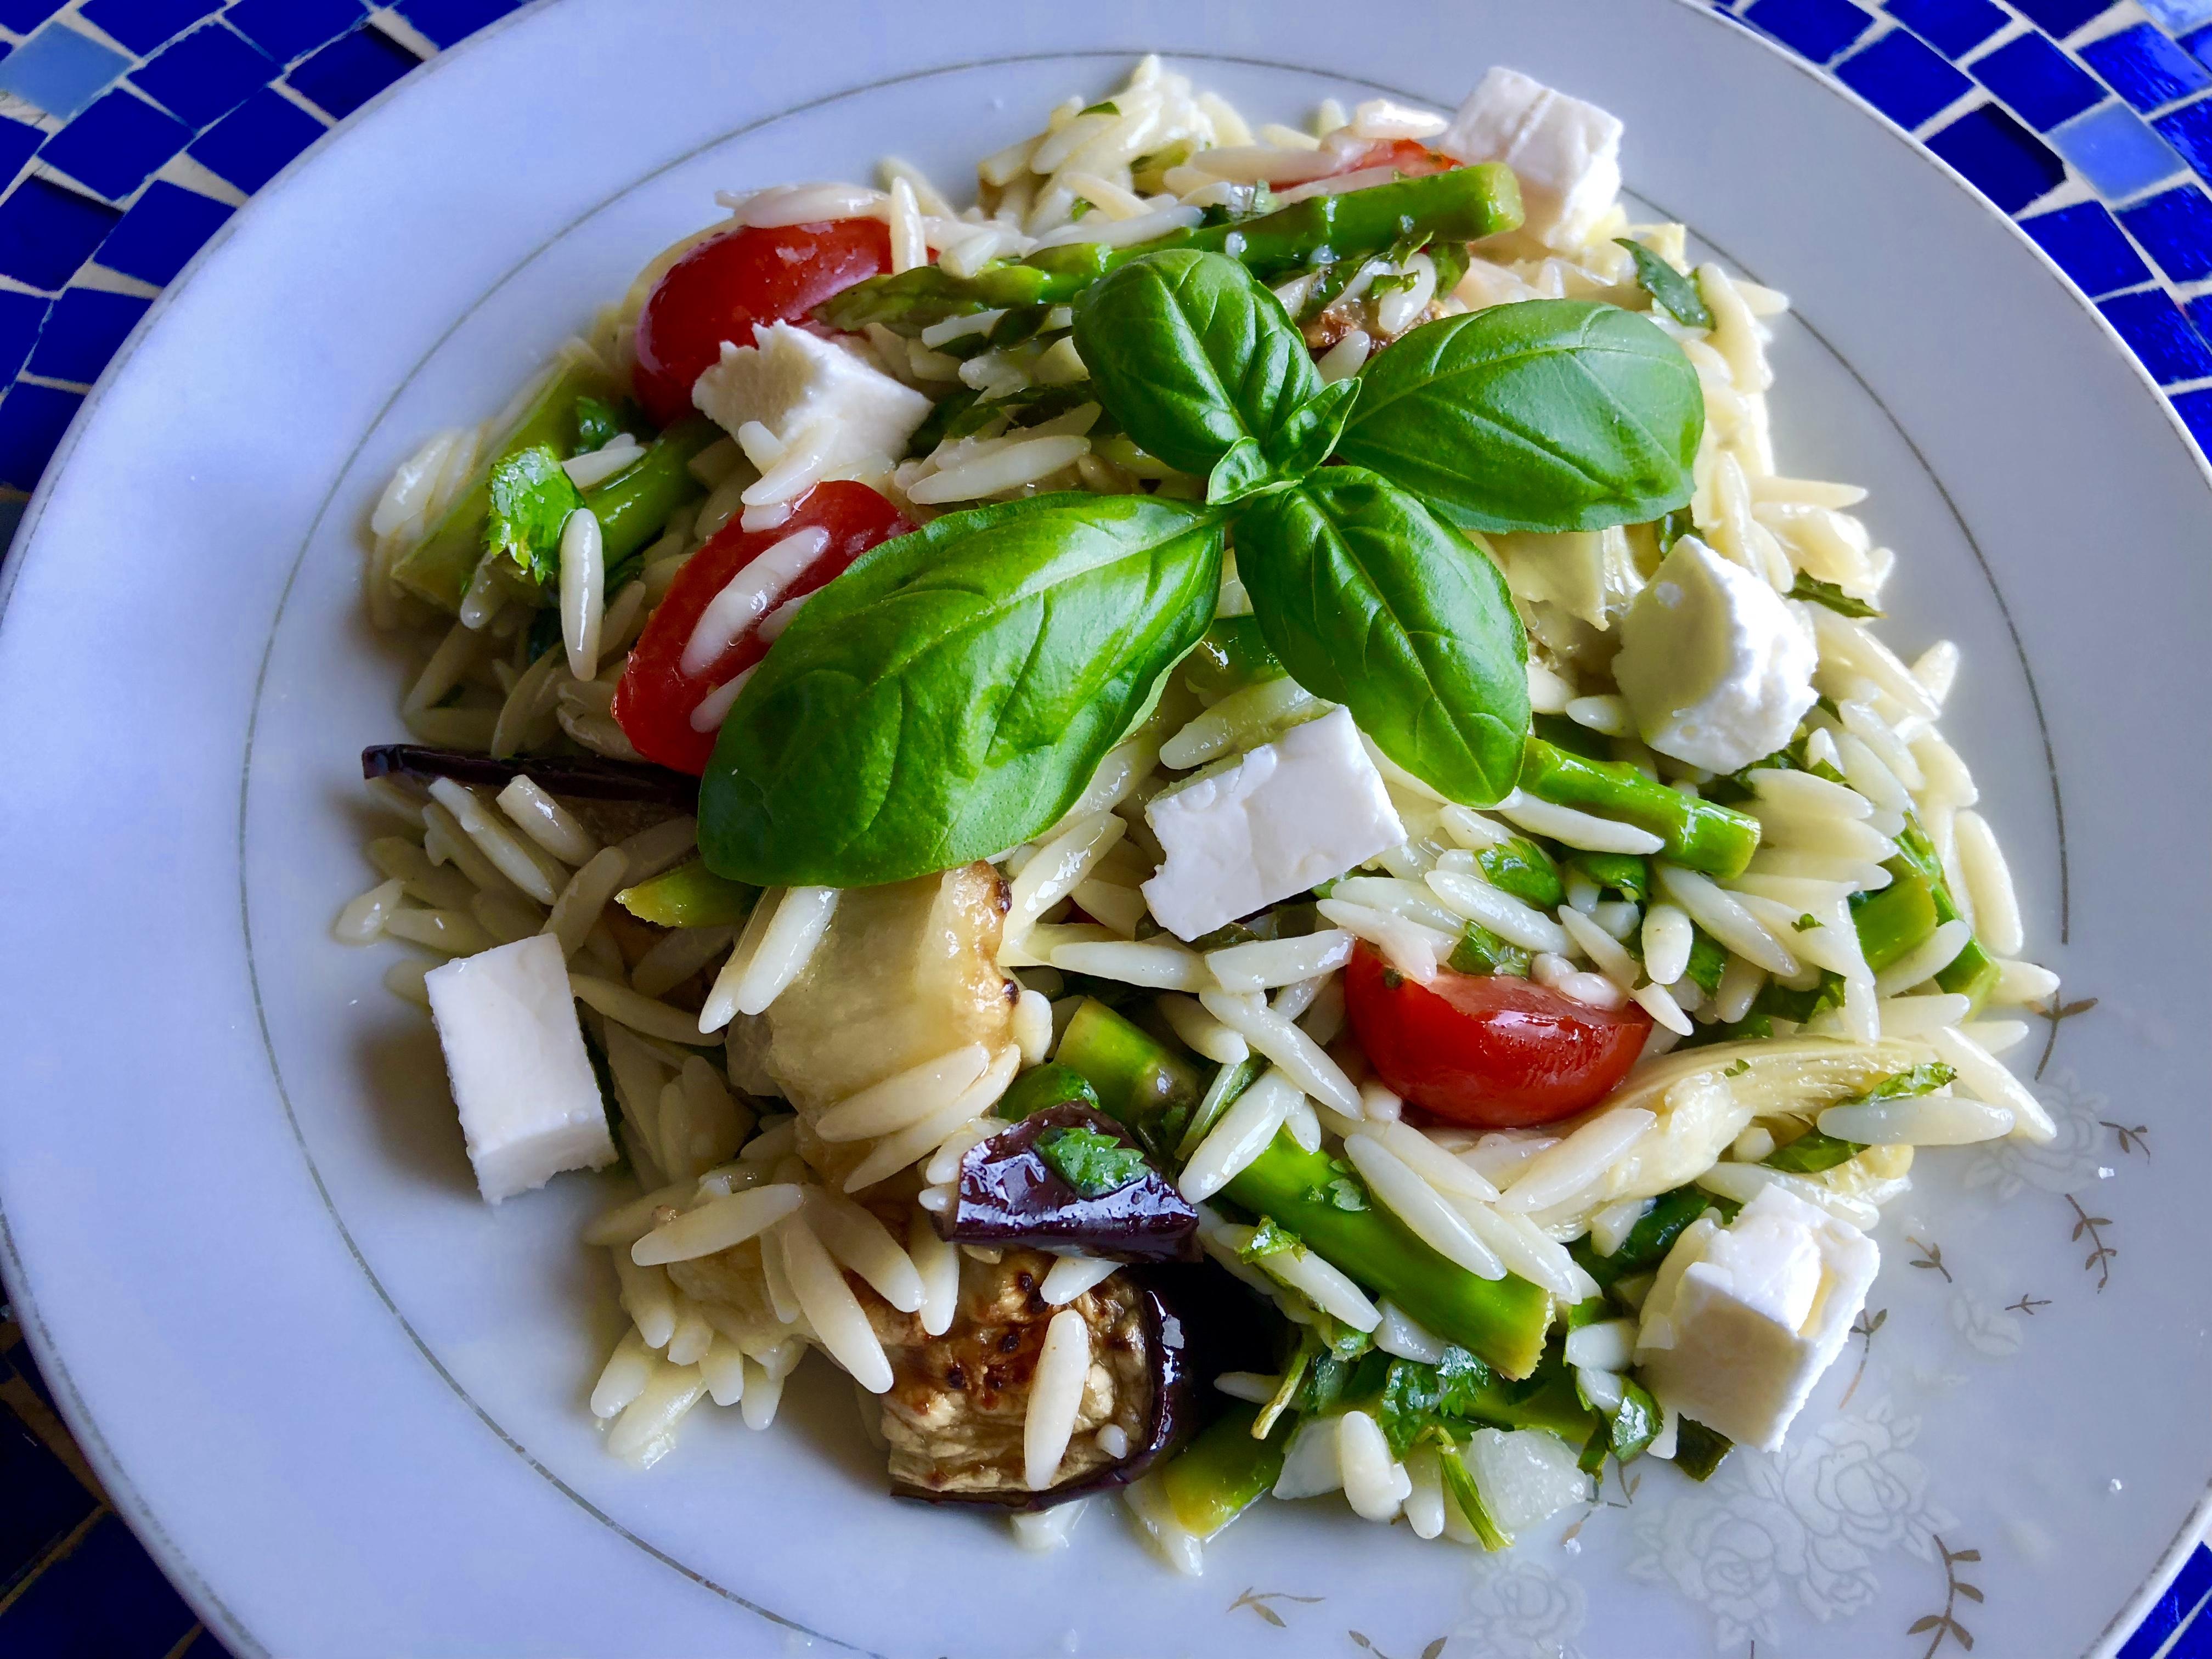 Summer Herb Orzo Salad with Lemon Vinaigrette from Alexandersmom.com